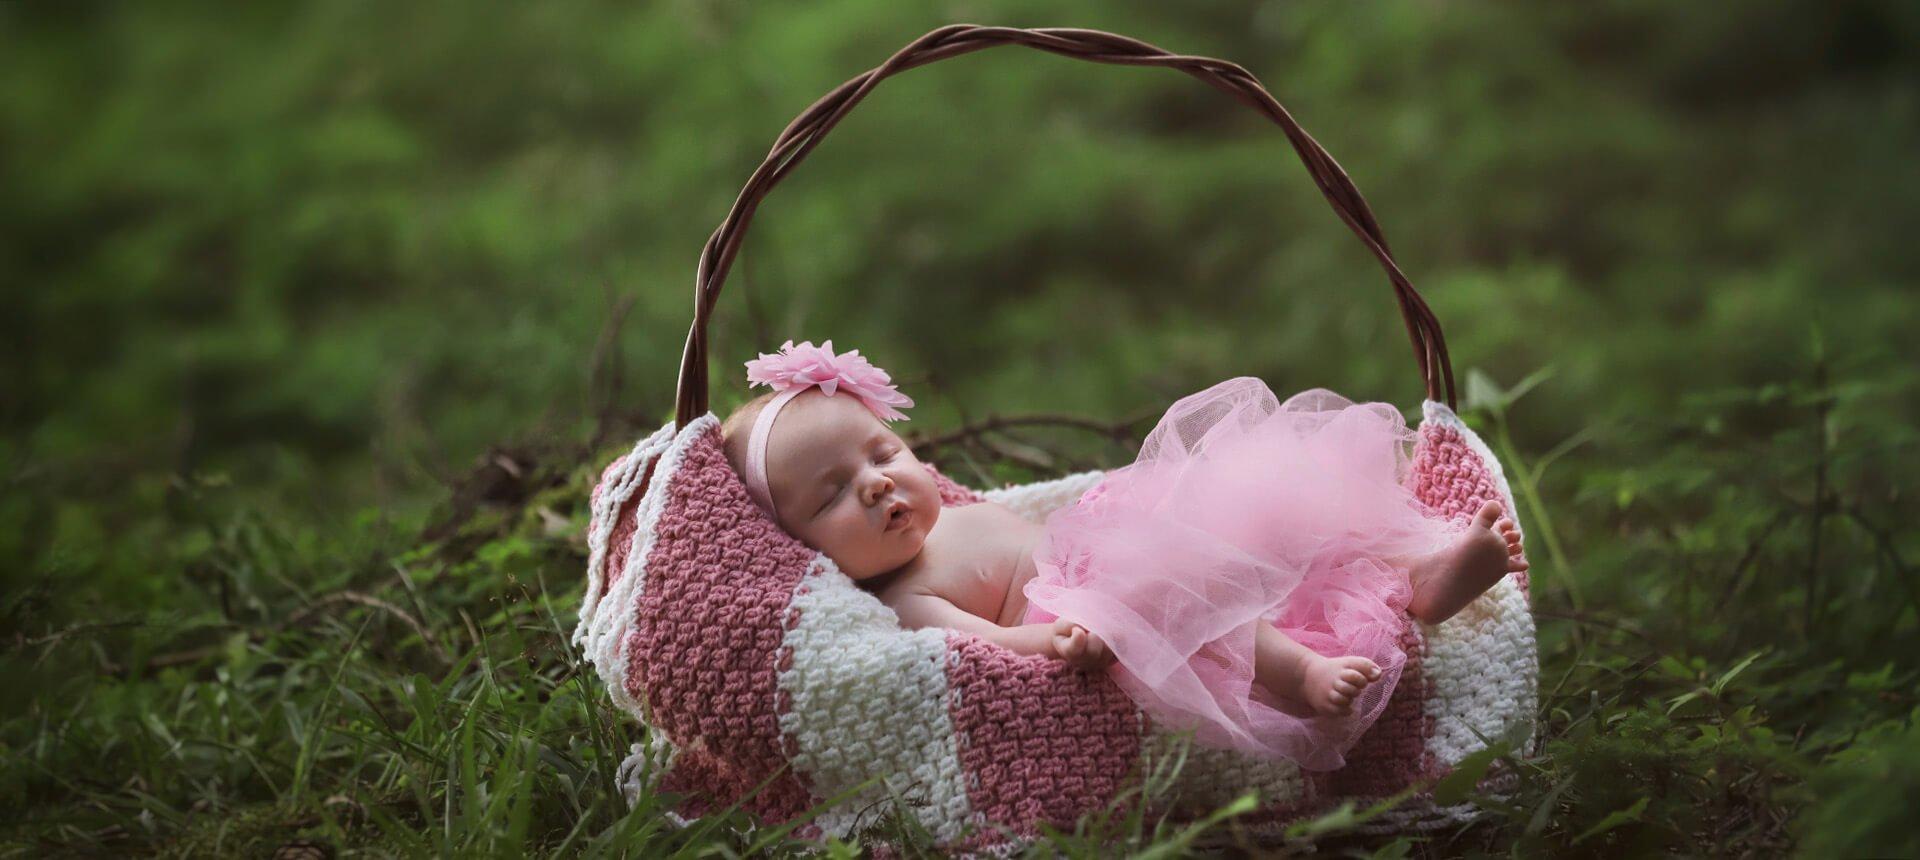 slider_baby_imwald